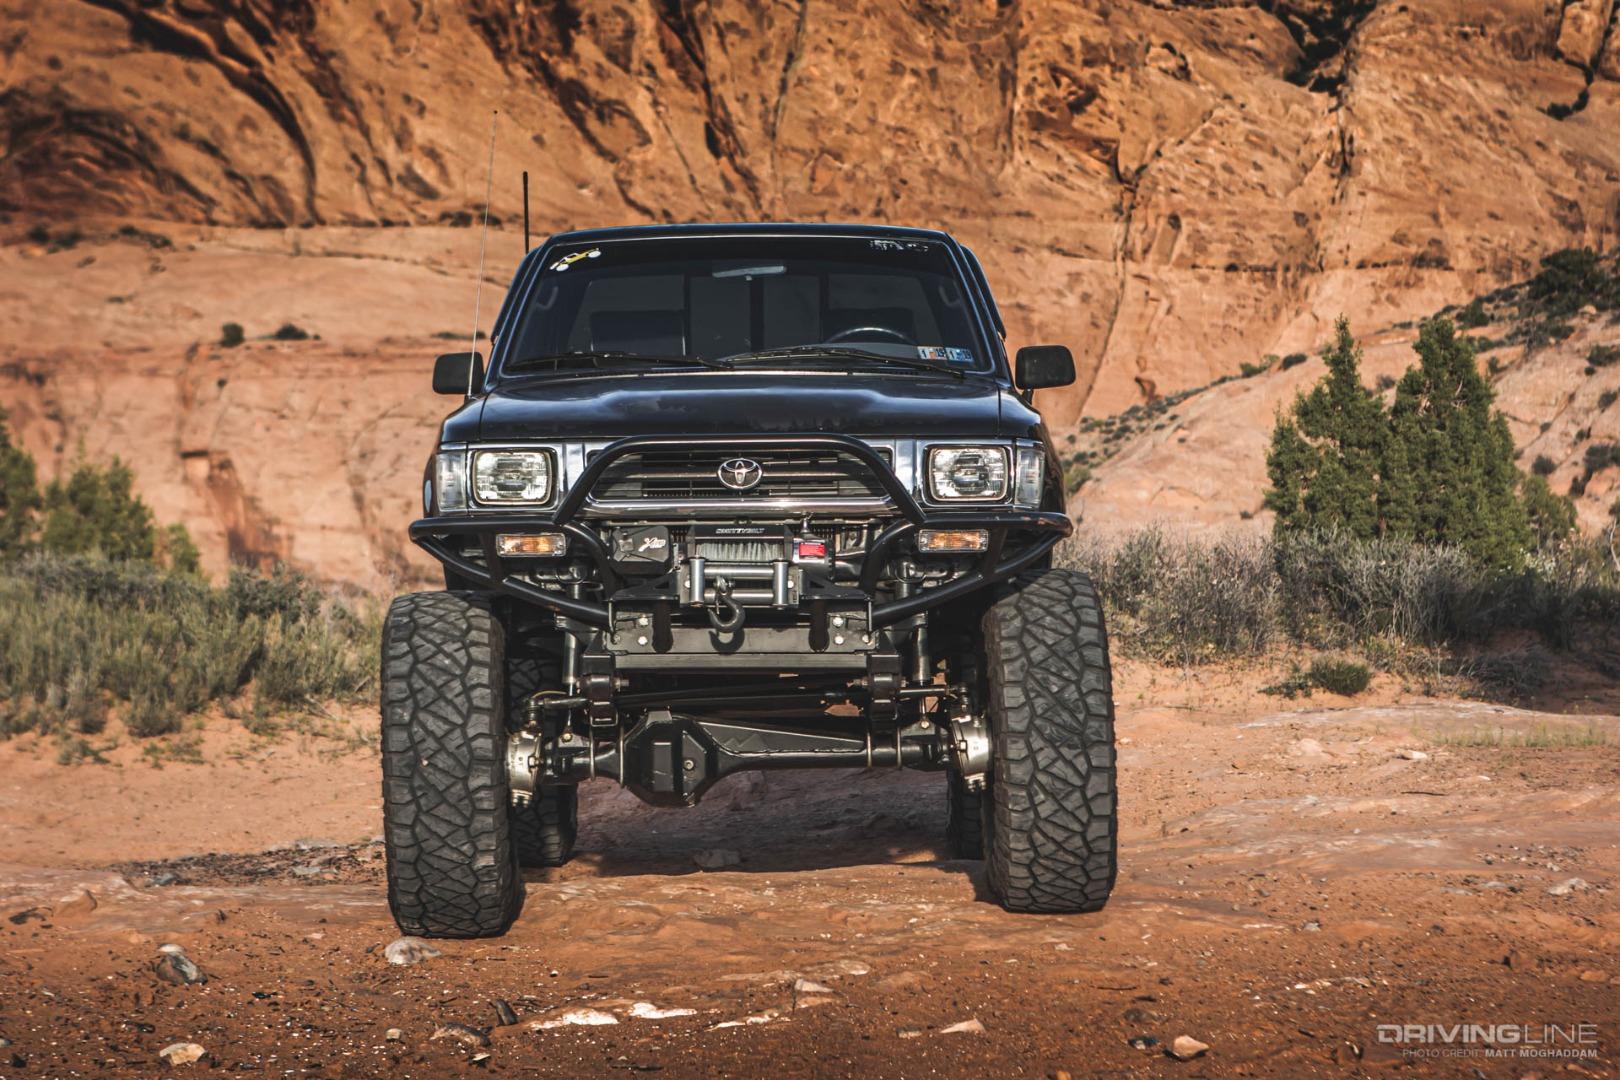 Daily Crawler Sas Toyota Truck Drivingline